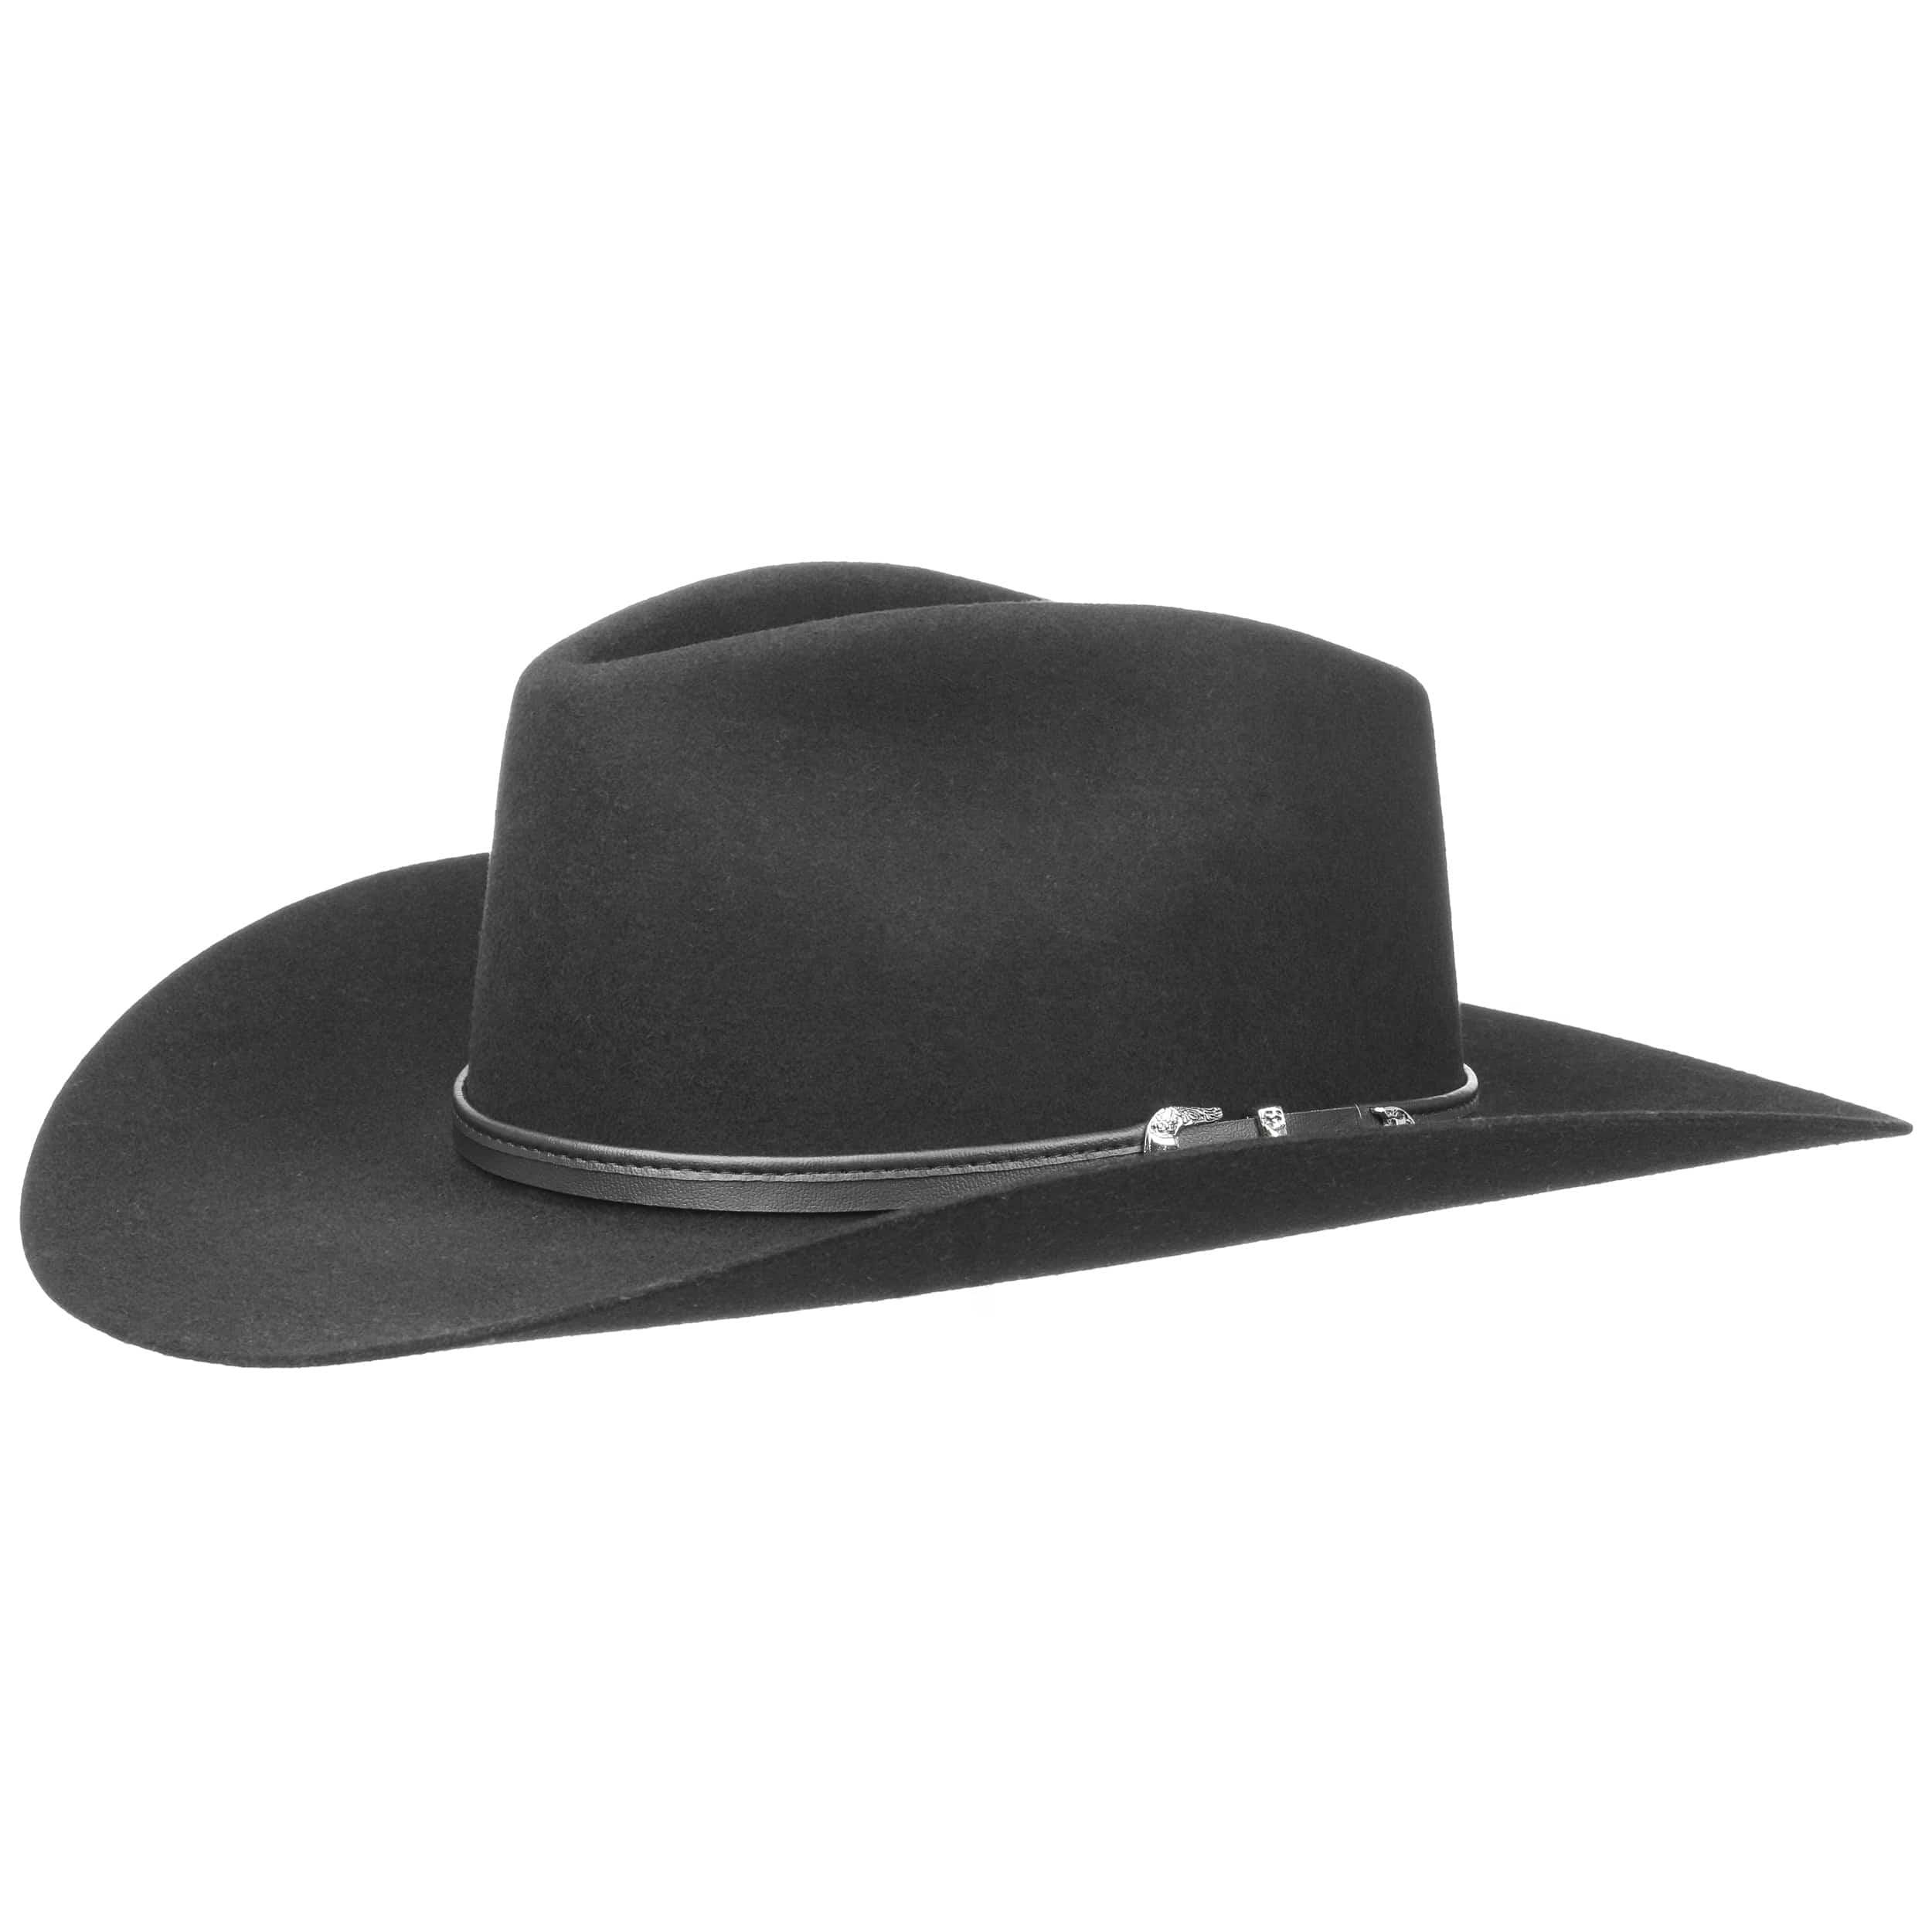 6399e950d41fd ... Seneca 4X Fur Felt Western Hat by Stetson - black 4 ...